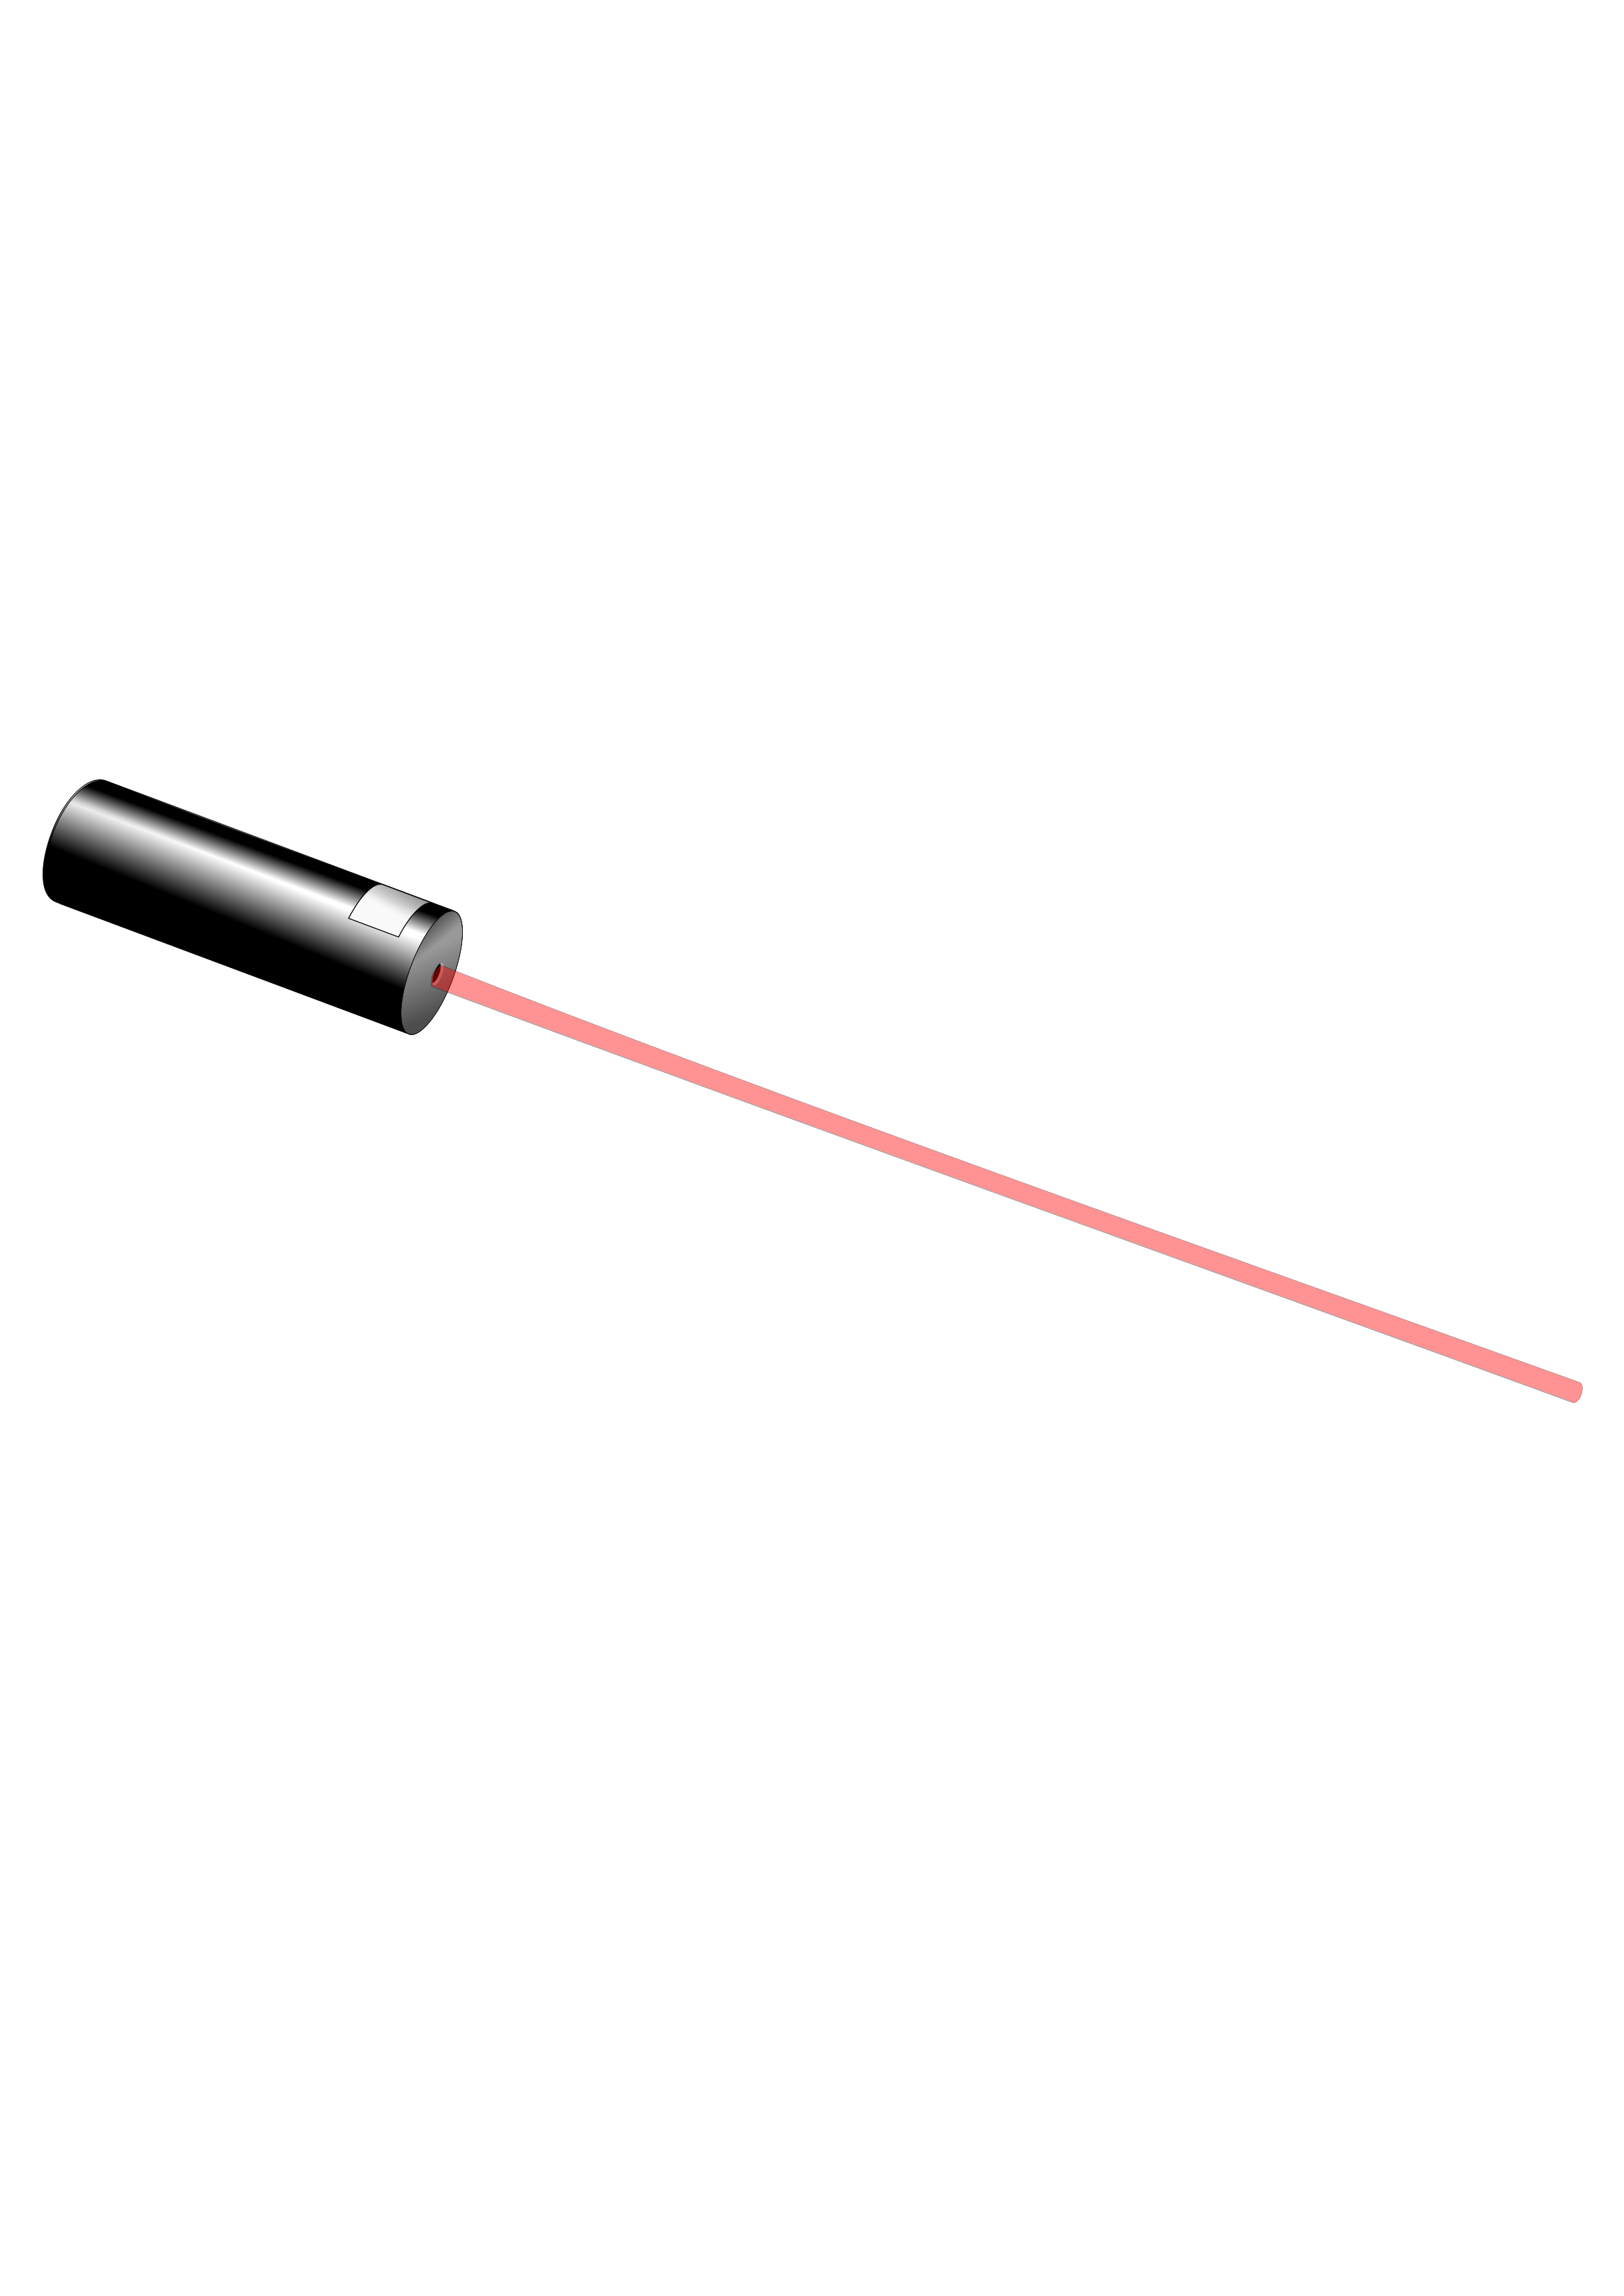 Laser Clipart.